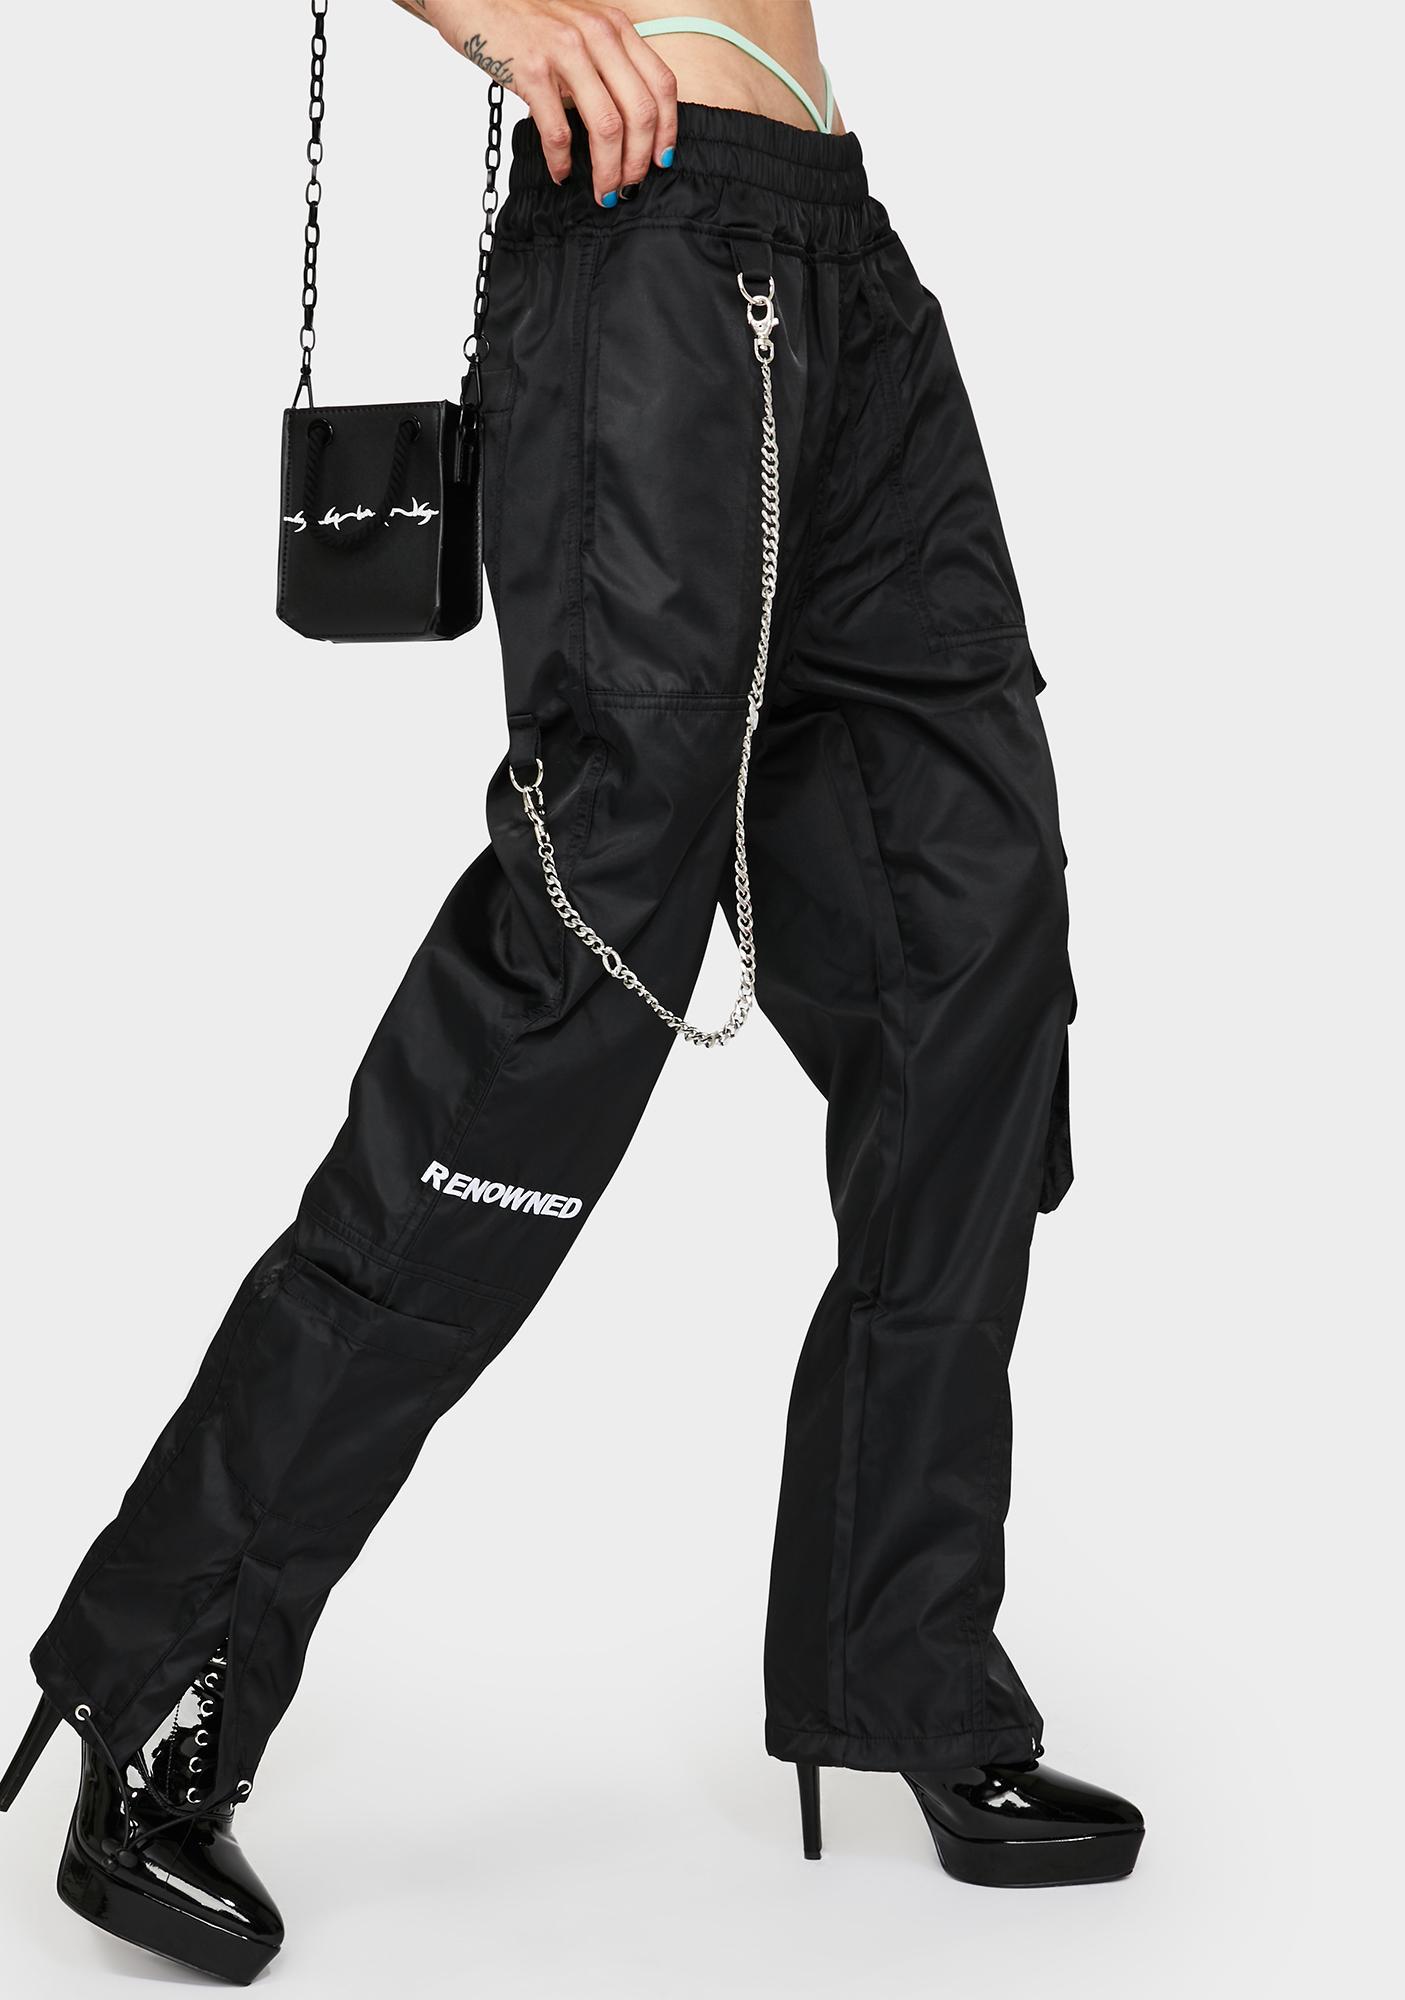 Renowned LA Tactical Nylon Pants